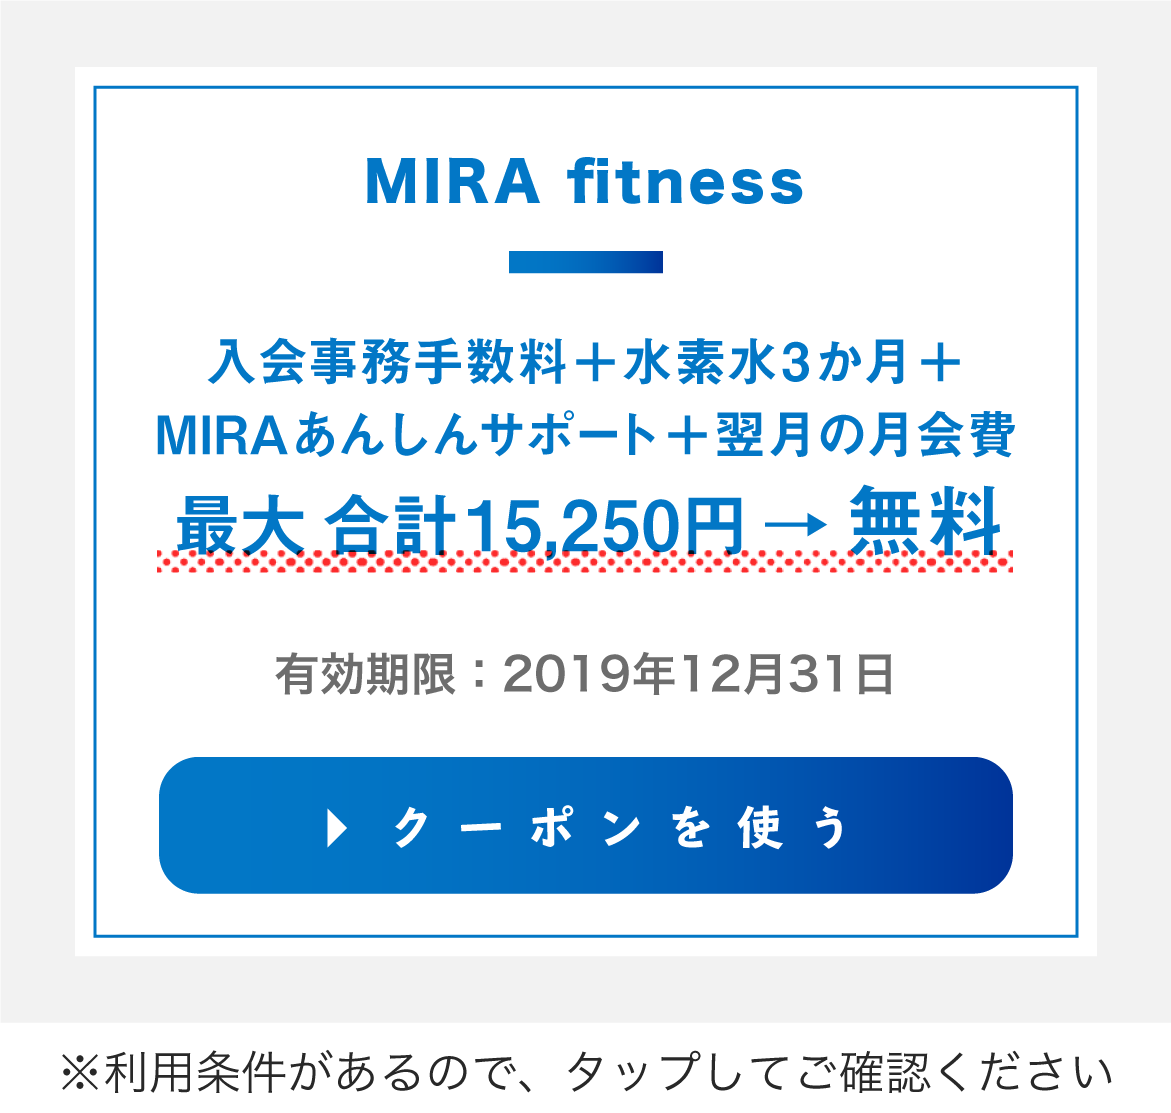 MIRA fitnessのクーポンを使用する